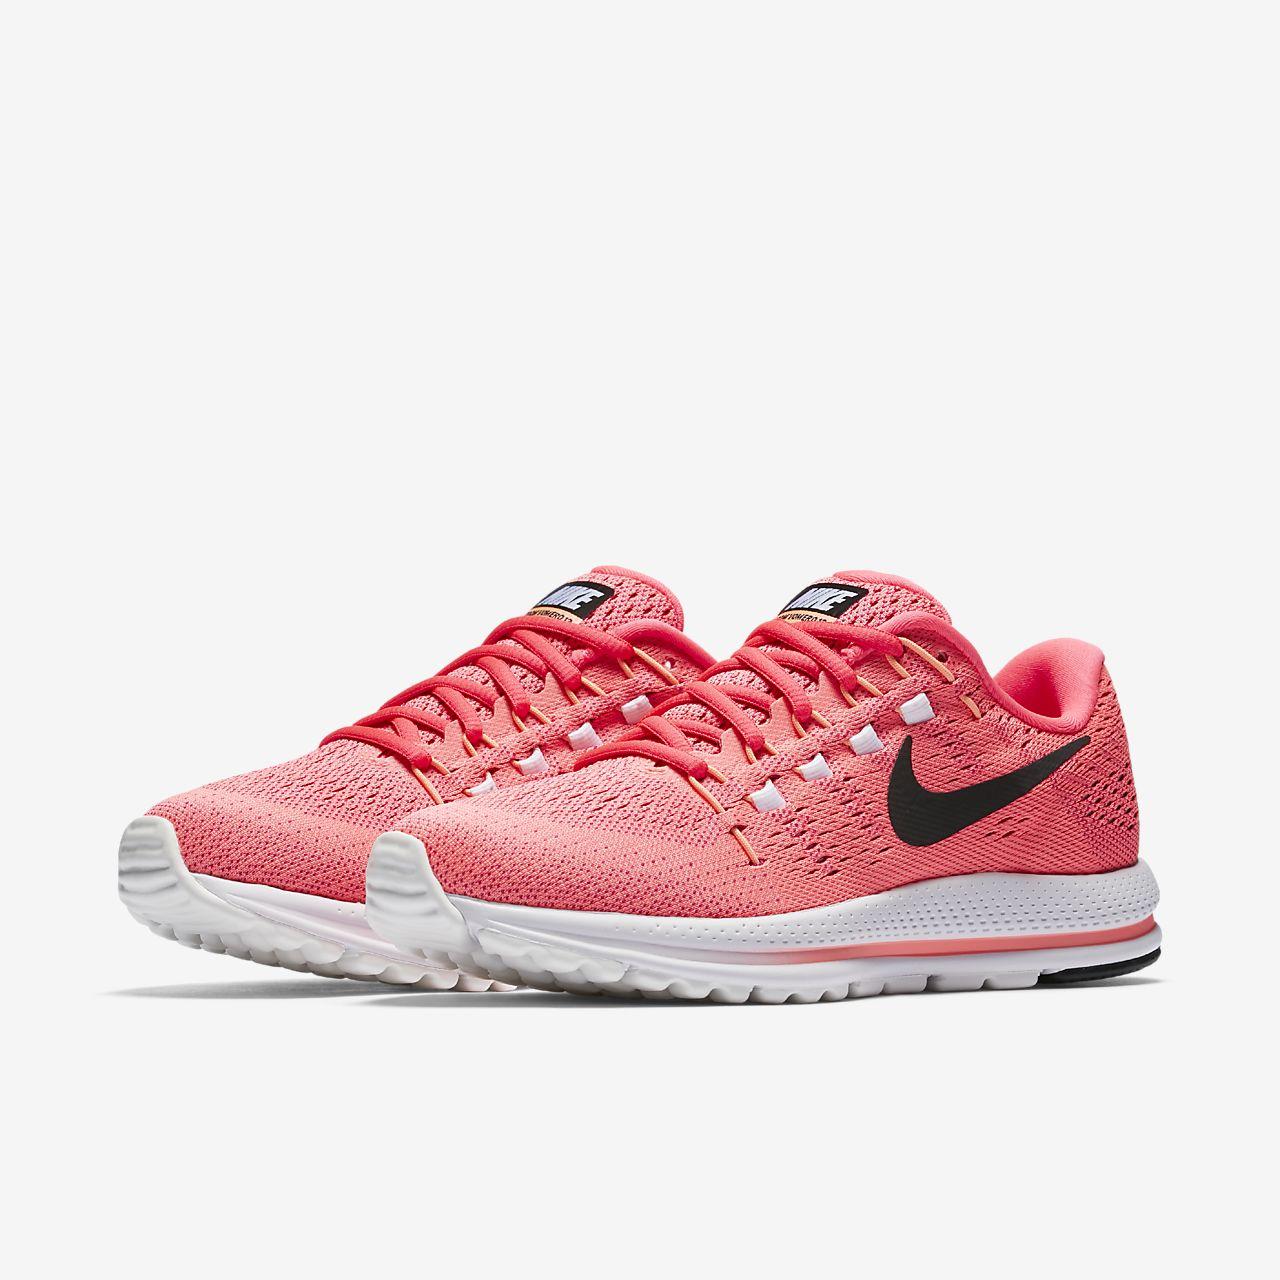 Air Femmes Zoom Vomero 12 Chaussures De Course Nike rpy99